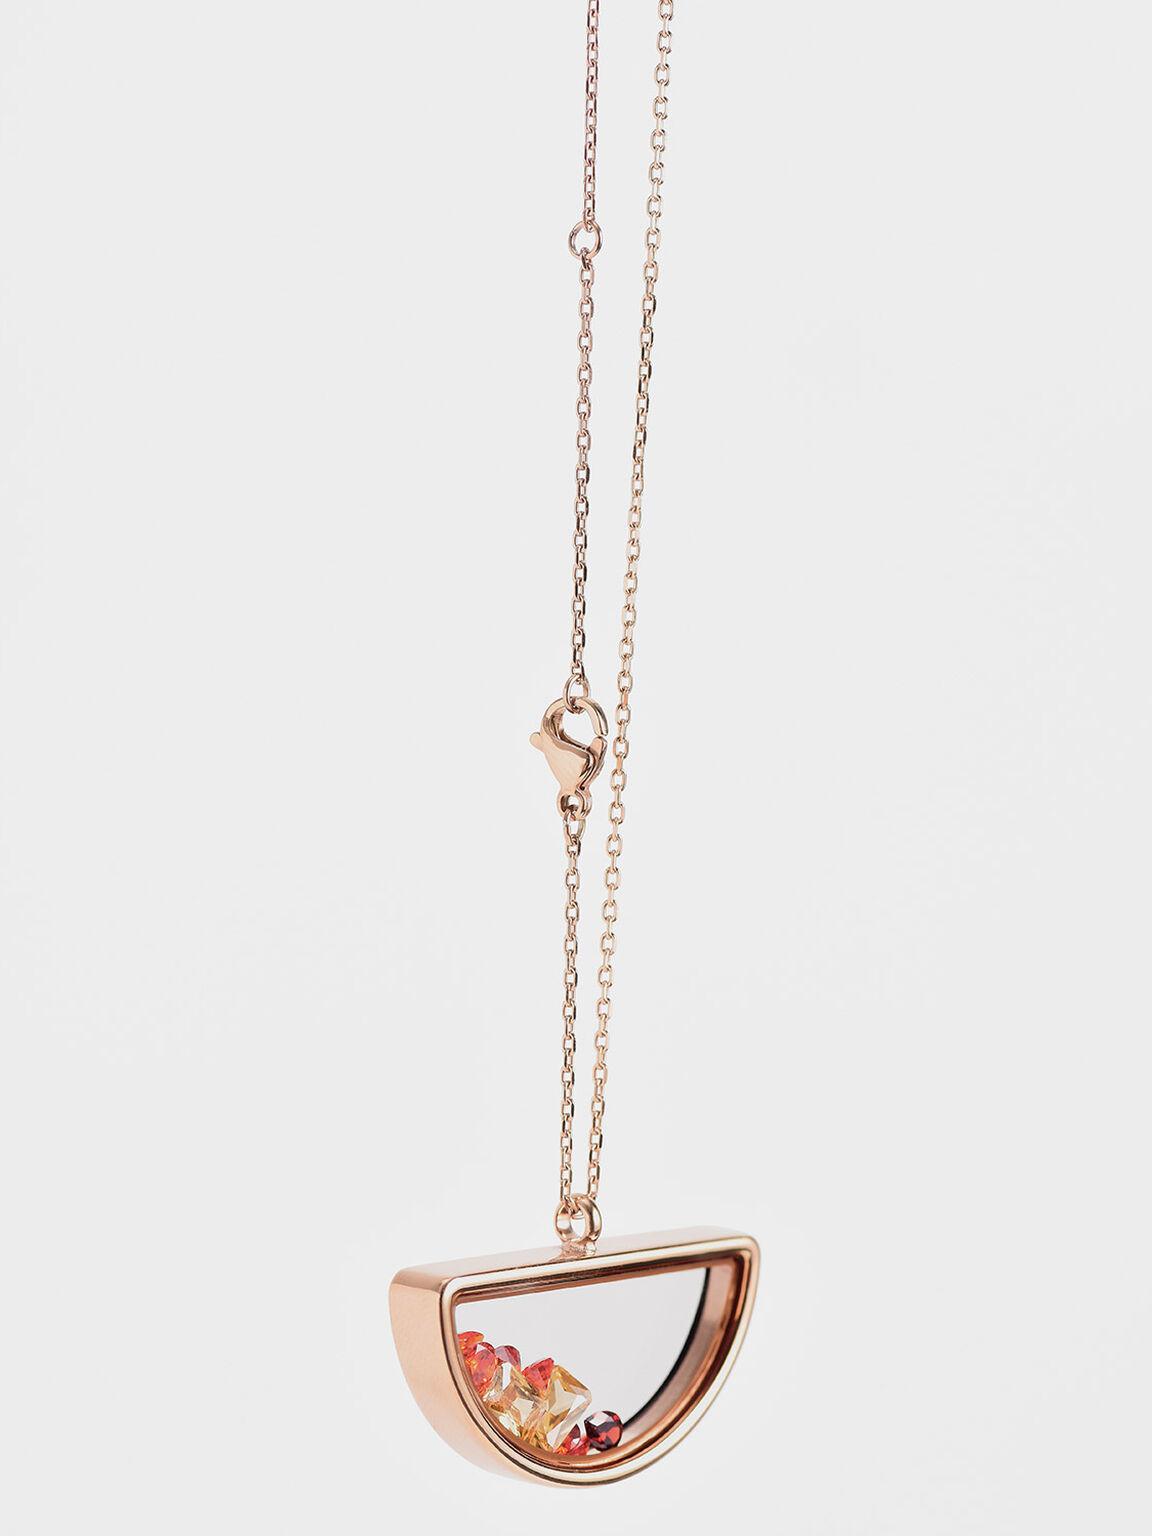 Semi-Circle Floating Locket Necklace, Rose Gold, hi-res